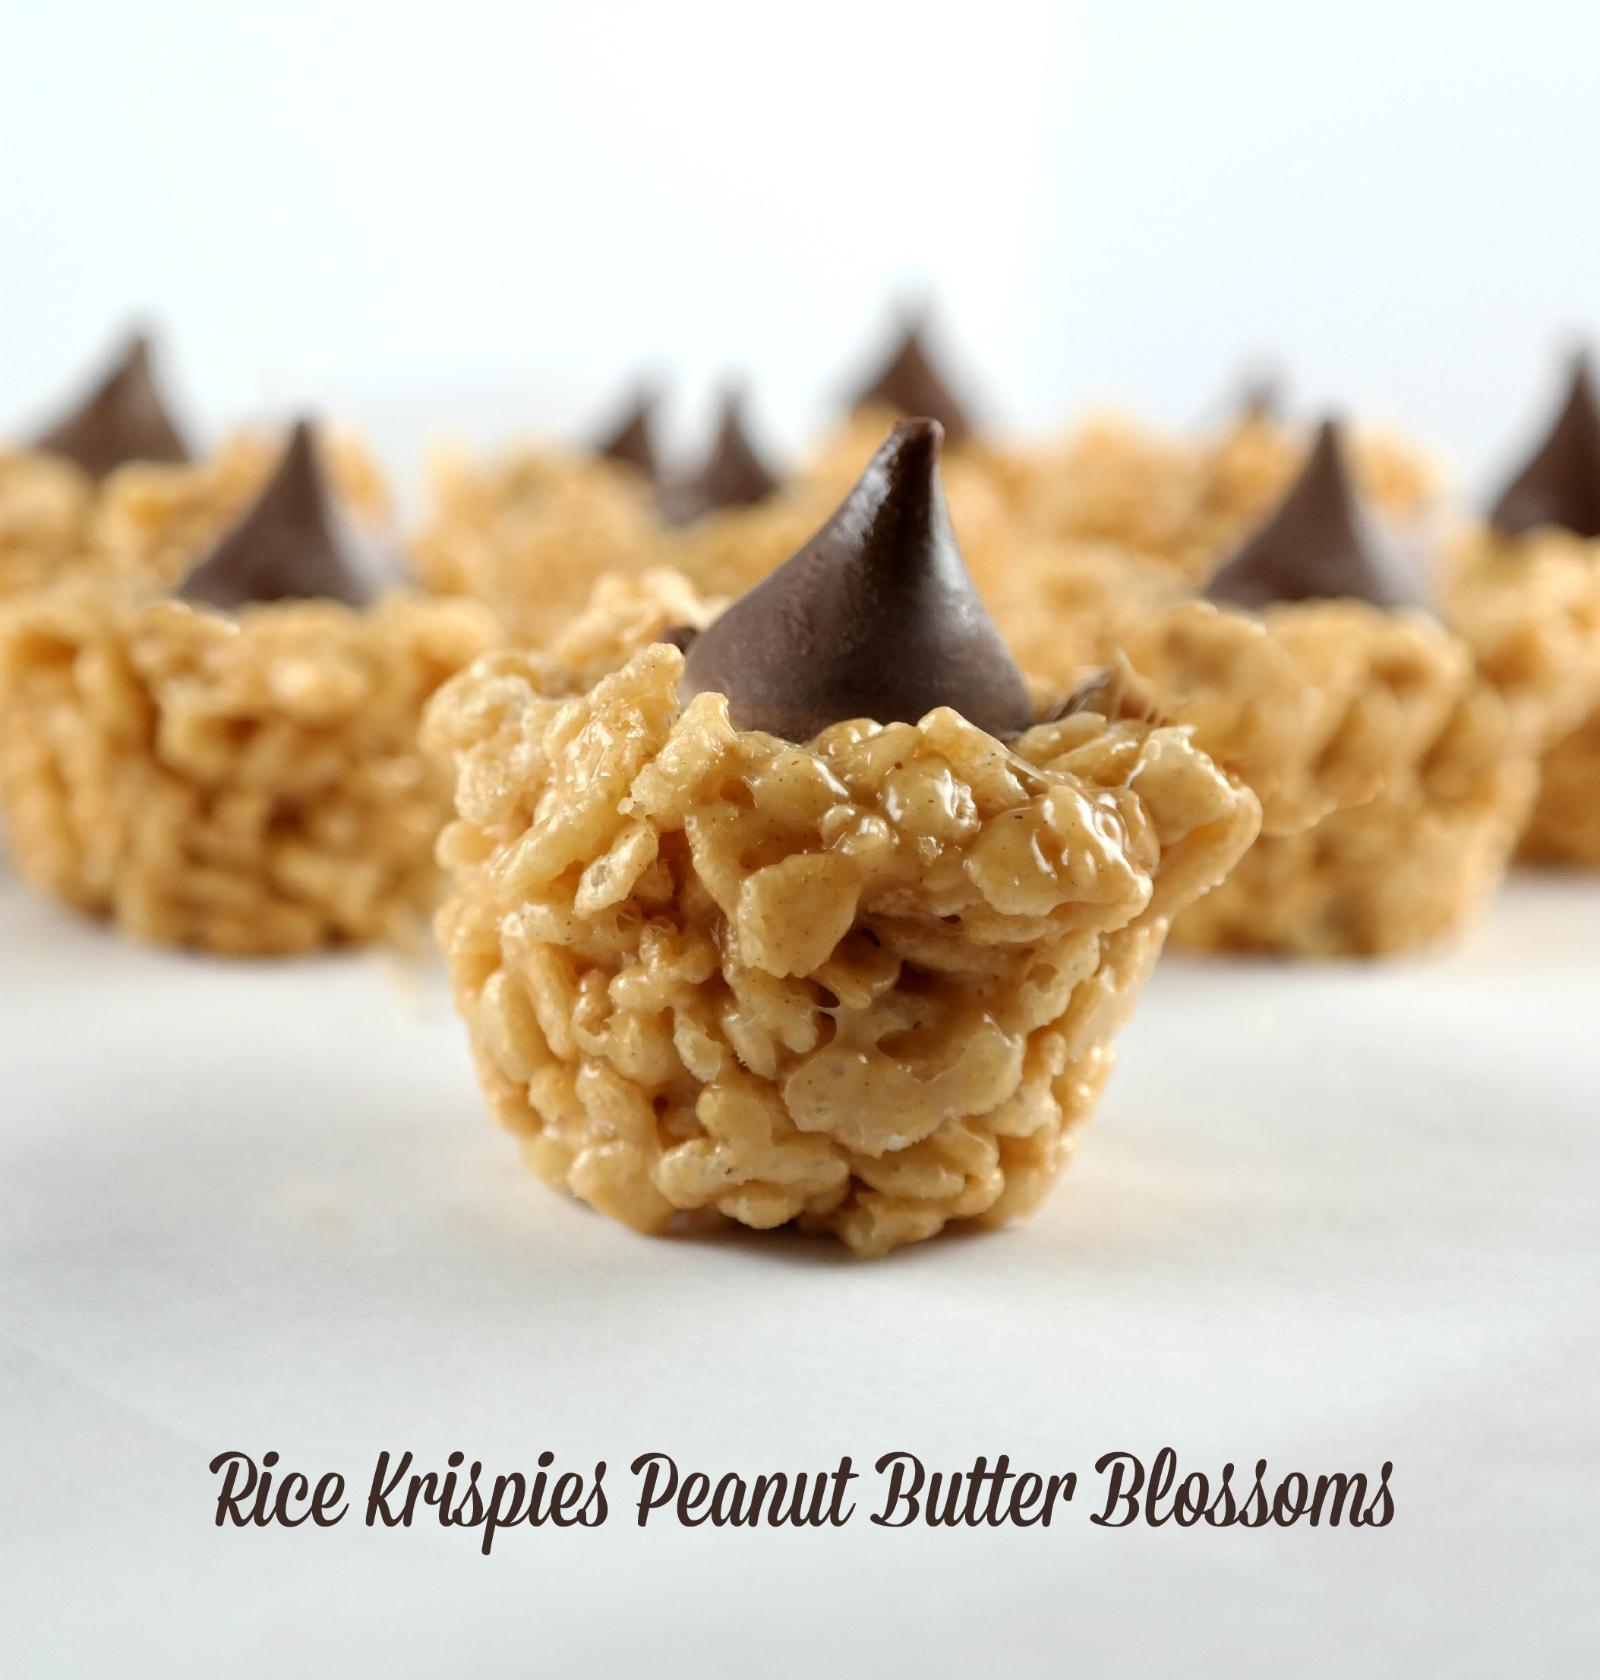 peanut butter blossoms rice krispies